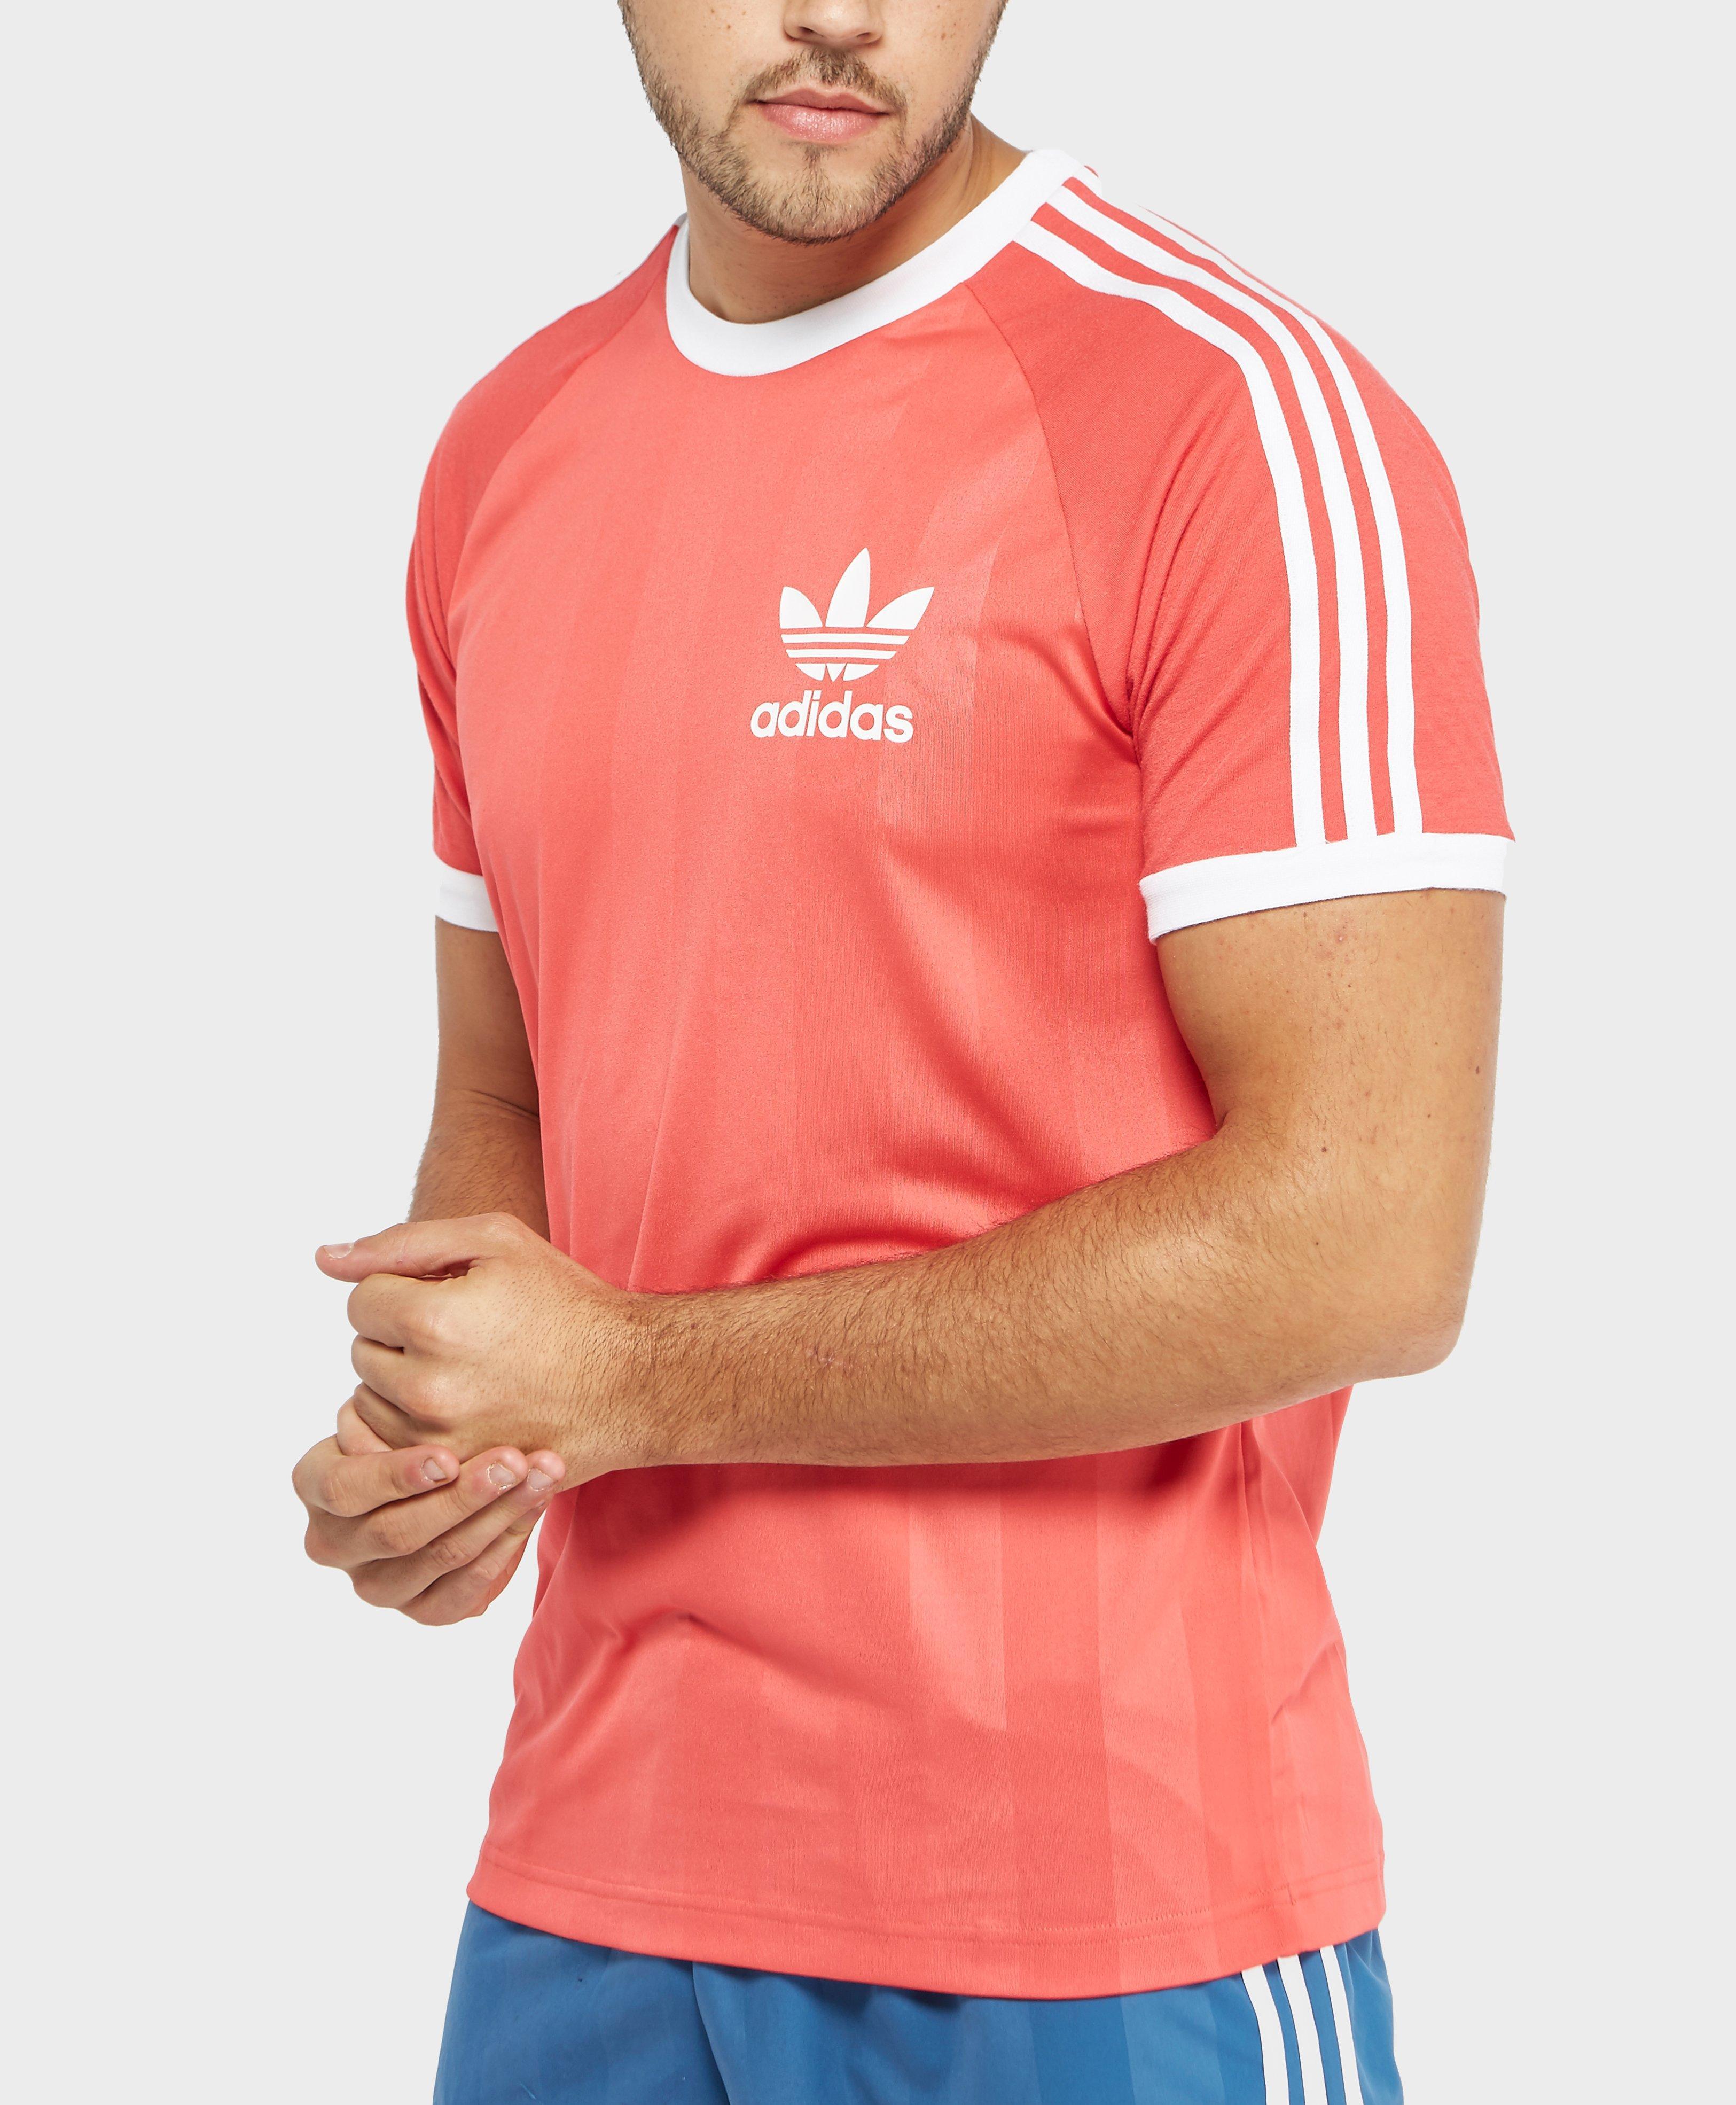 Originals T In California Trefoil Shirt Adidas Synthetic